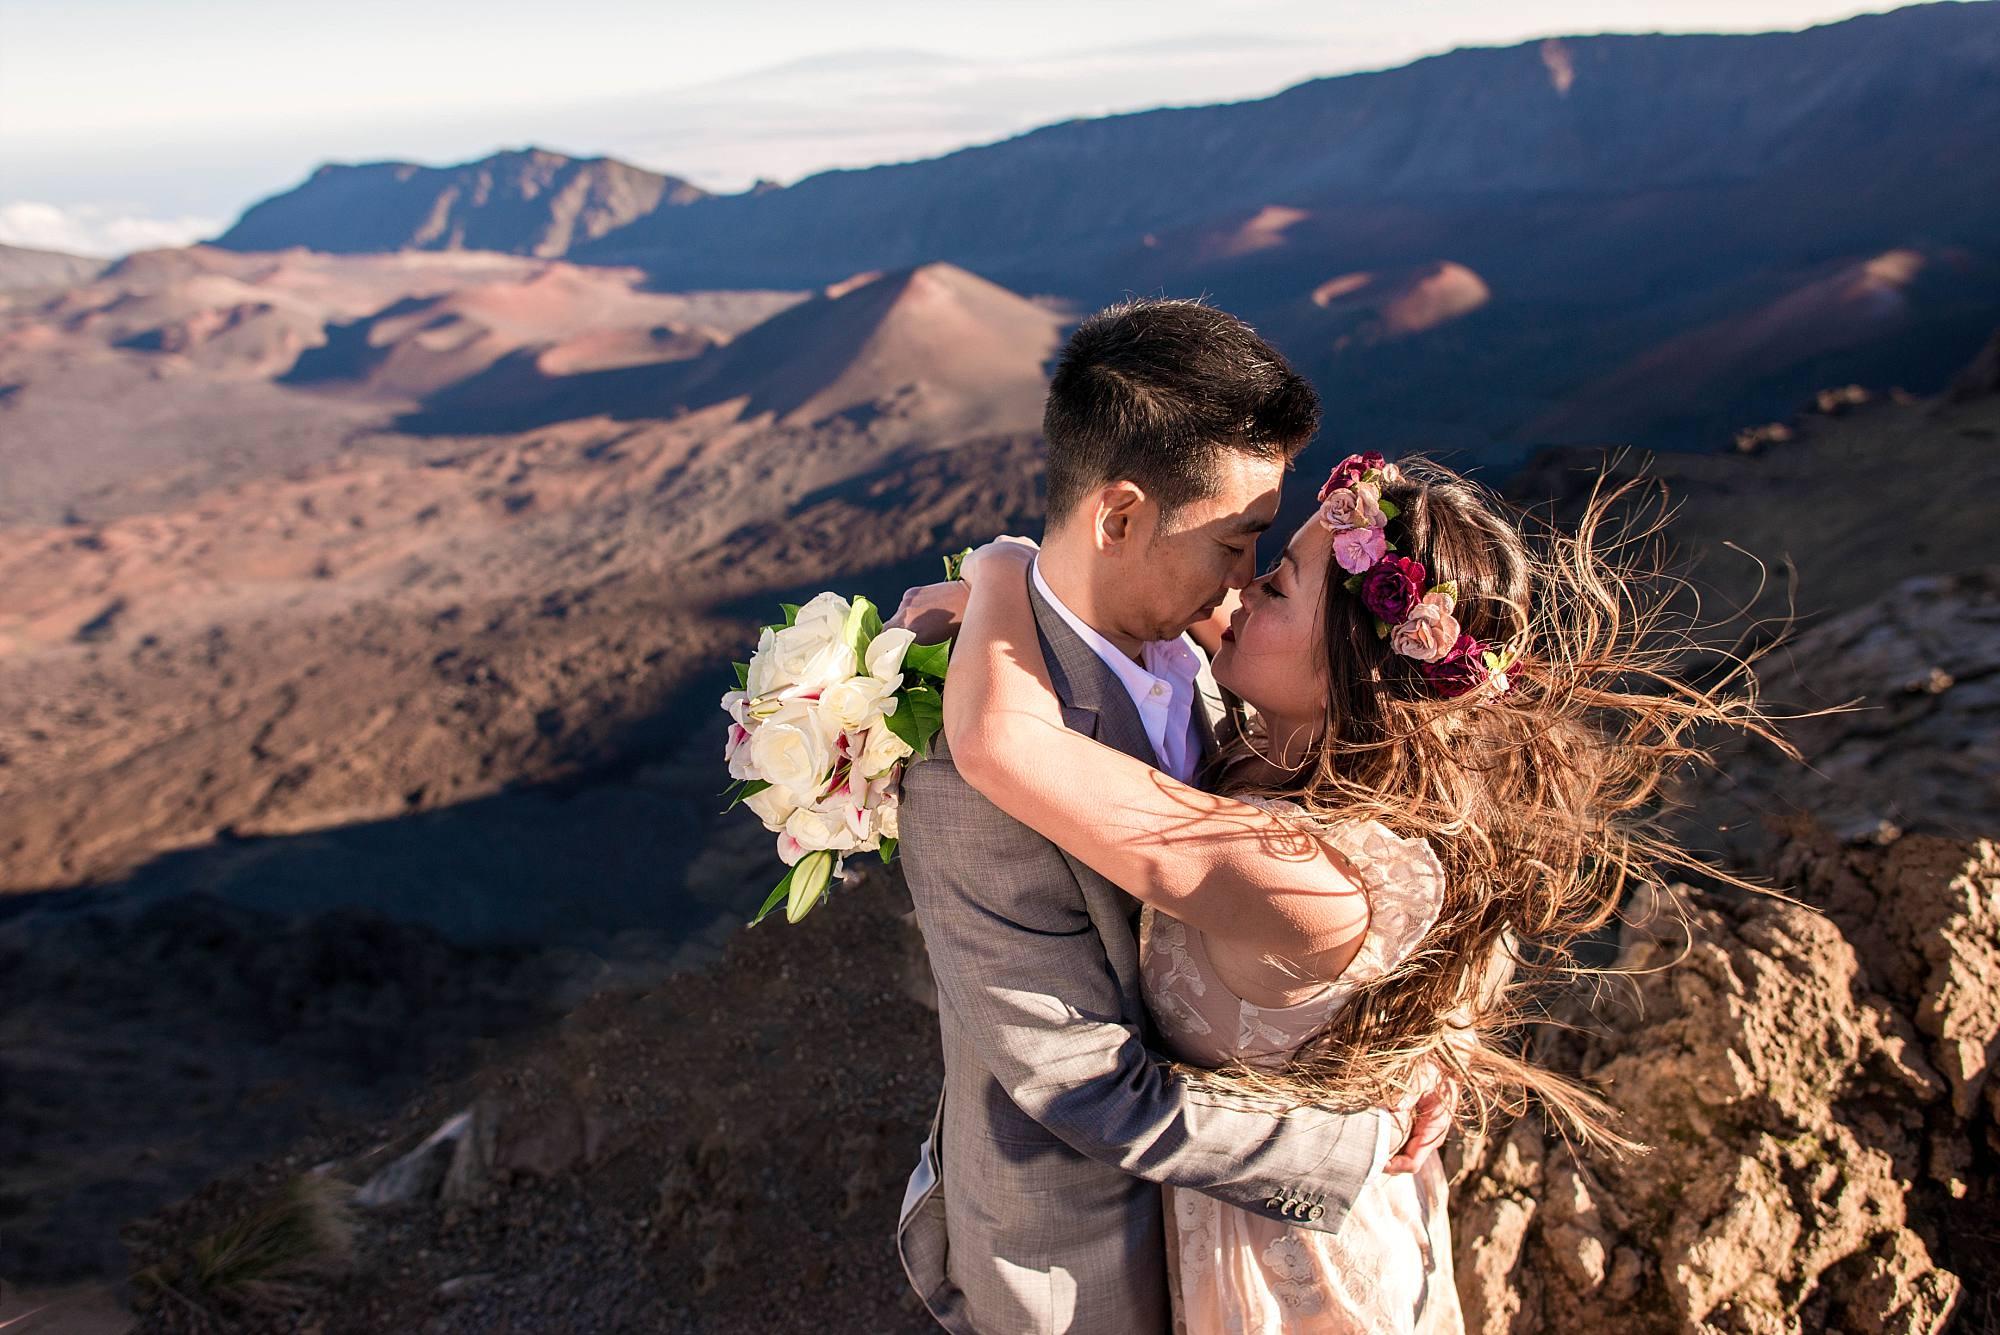 wedding couple hugging, wind blowing hair